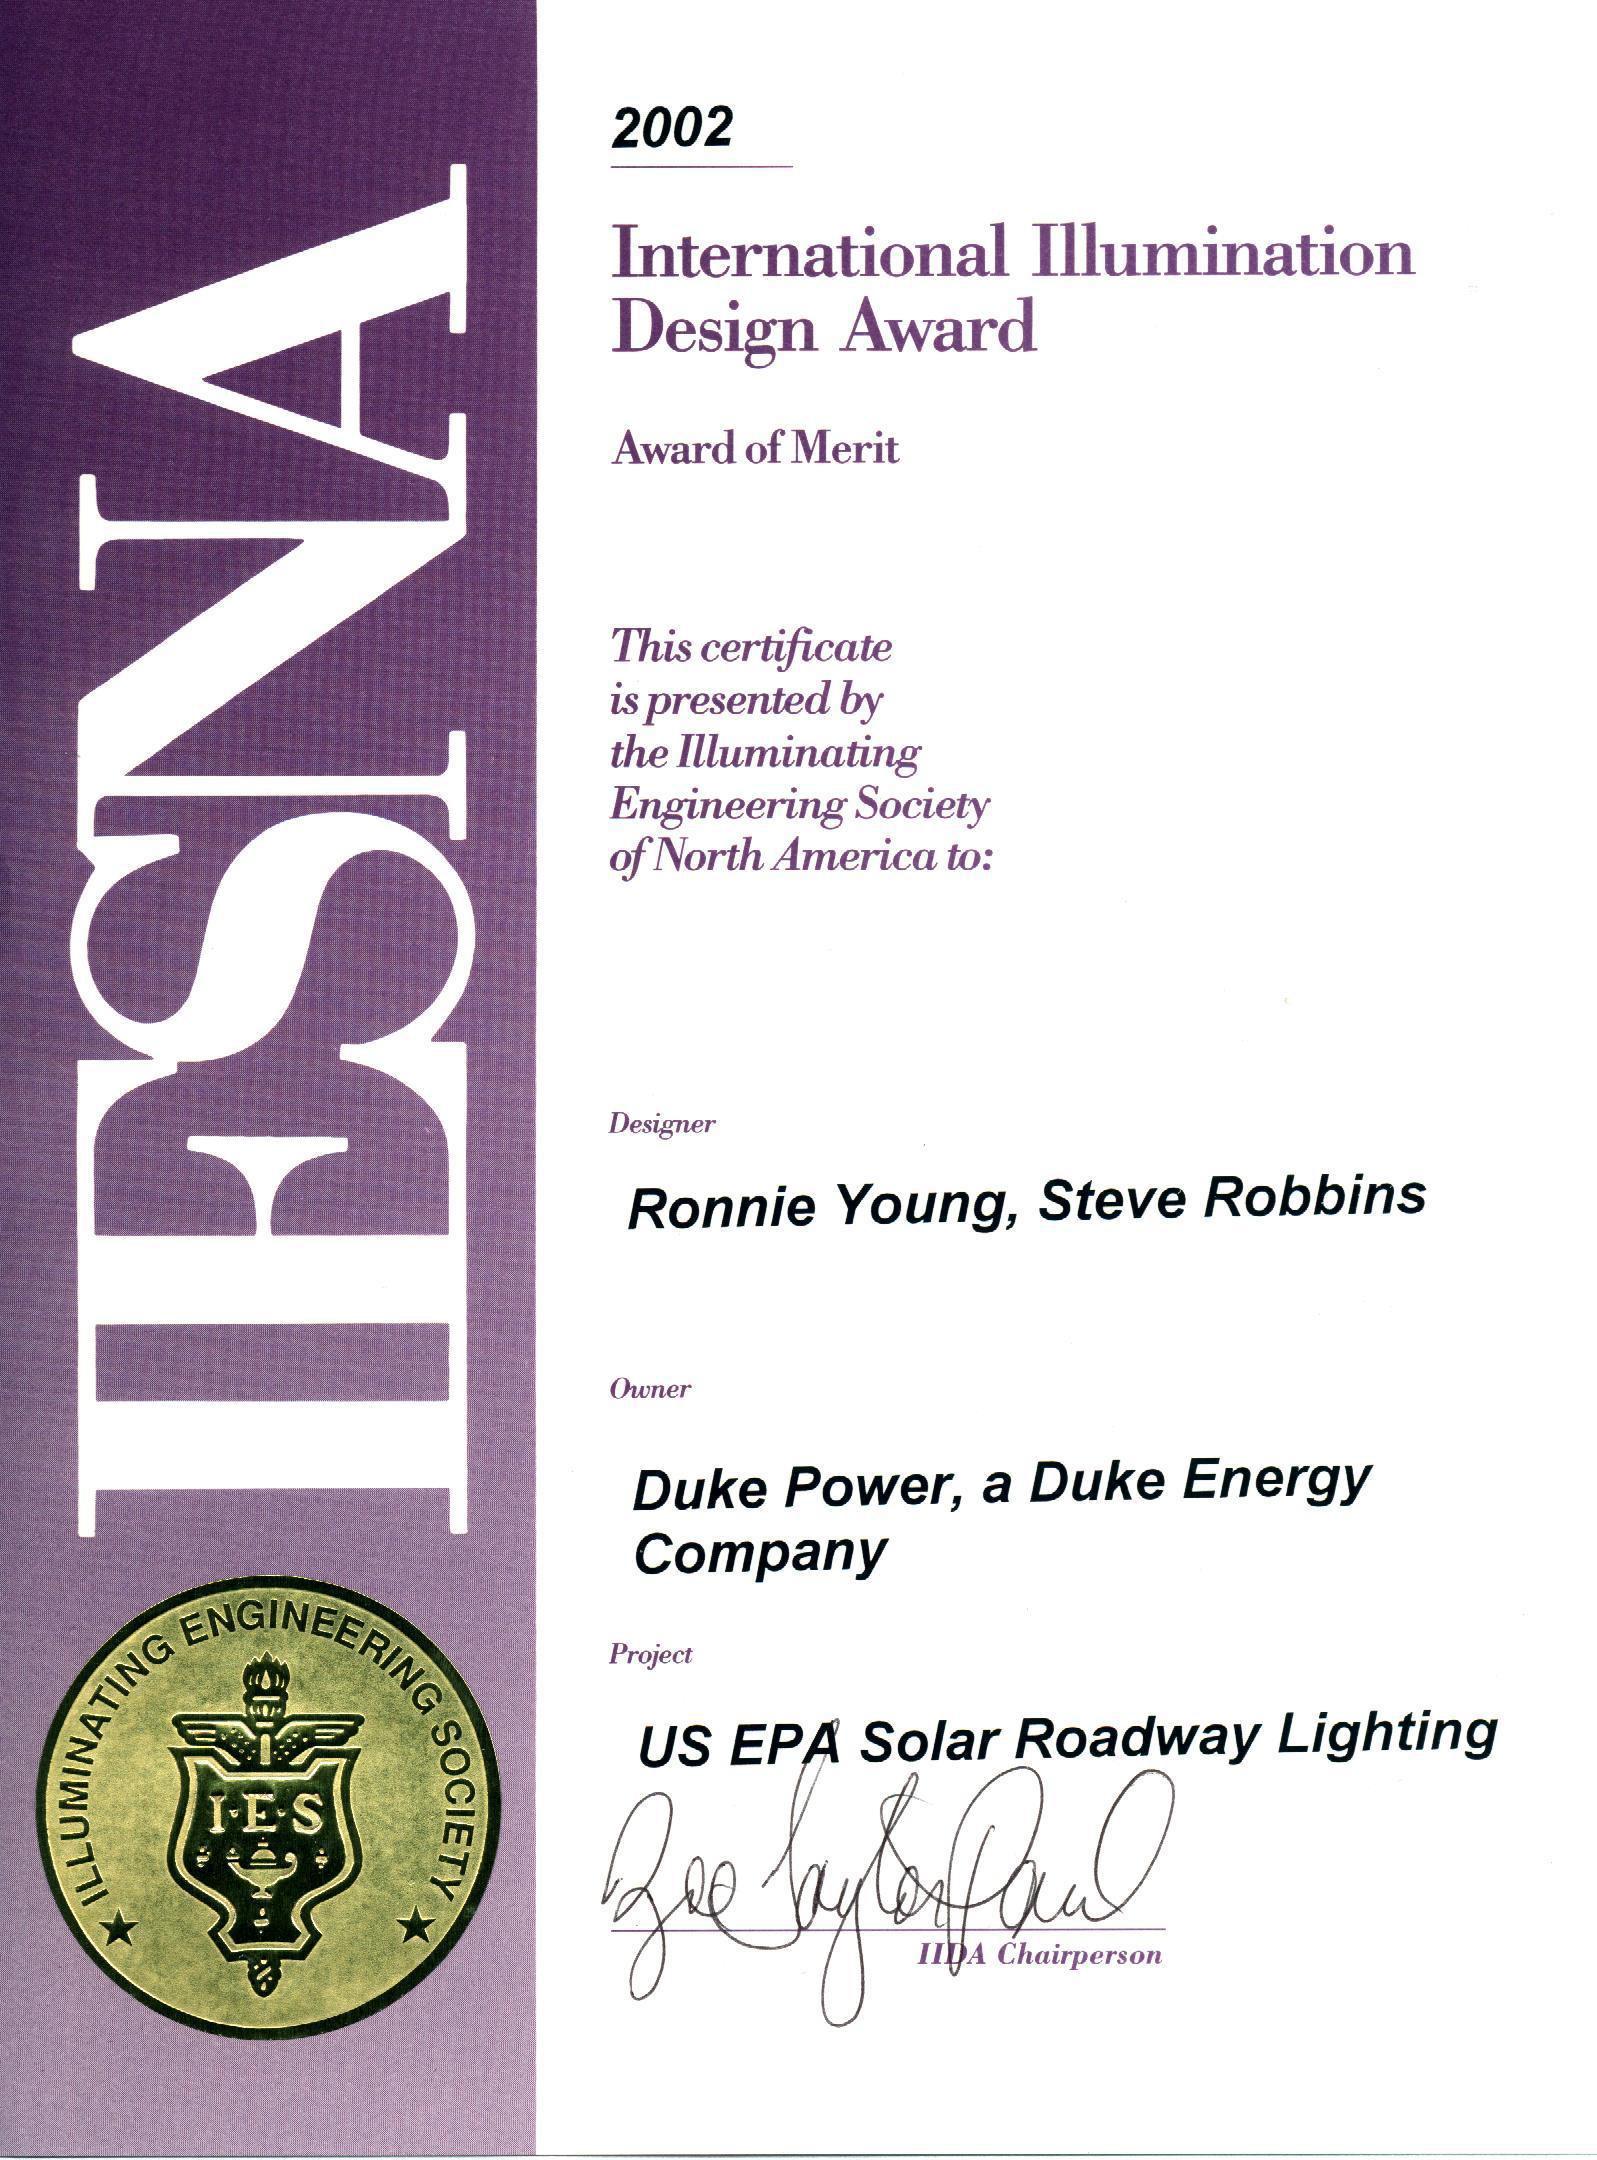 IESNA Award Solar Roadway Lighting